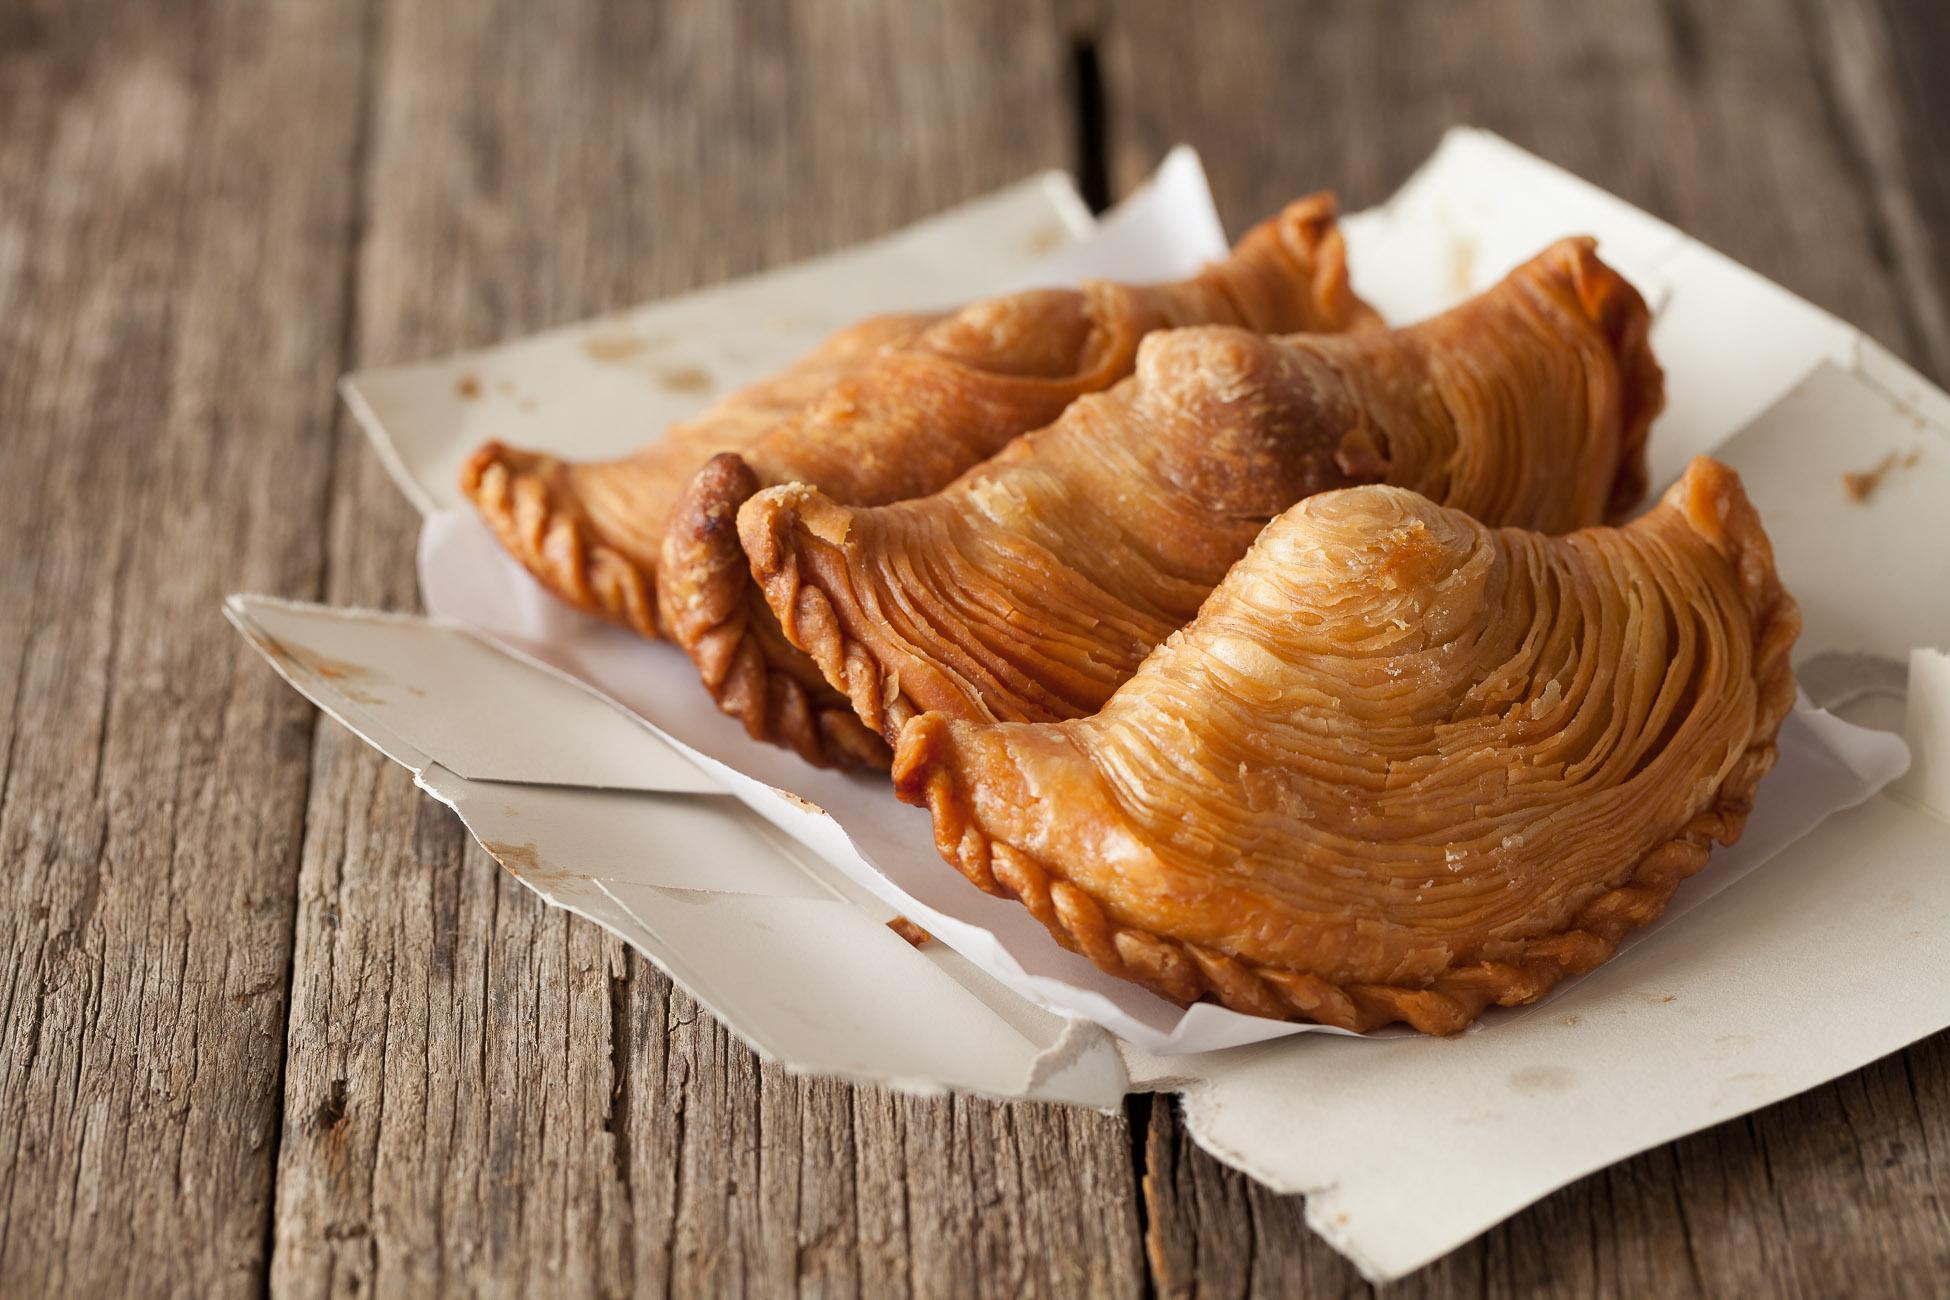 goncalo-barriga-photographer-editorial-food-lifestyle-020.jpg